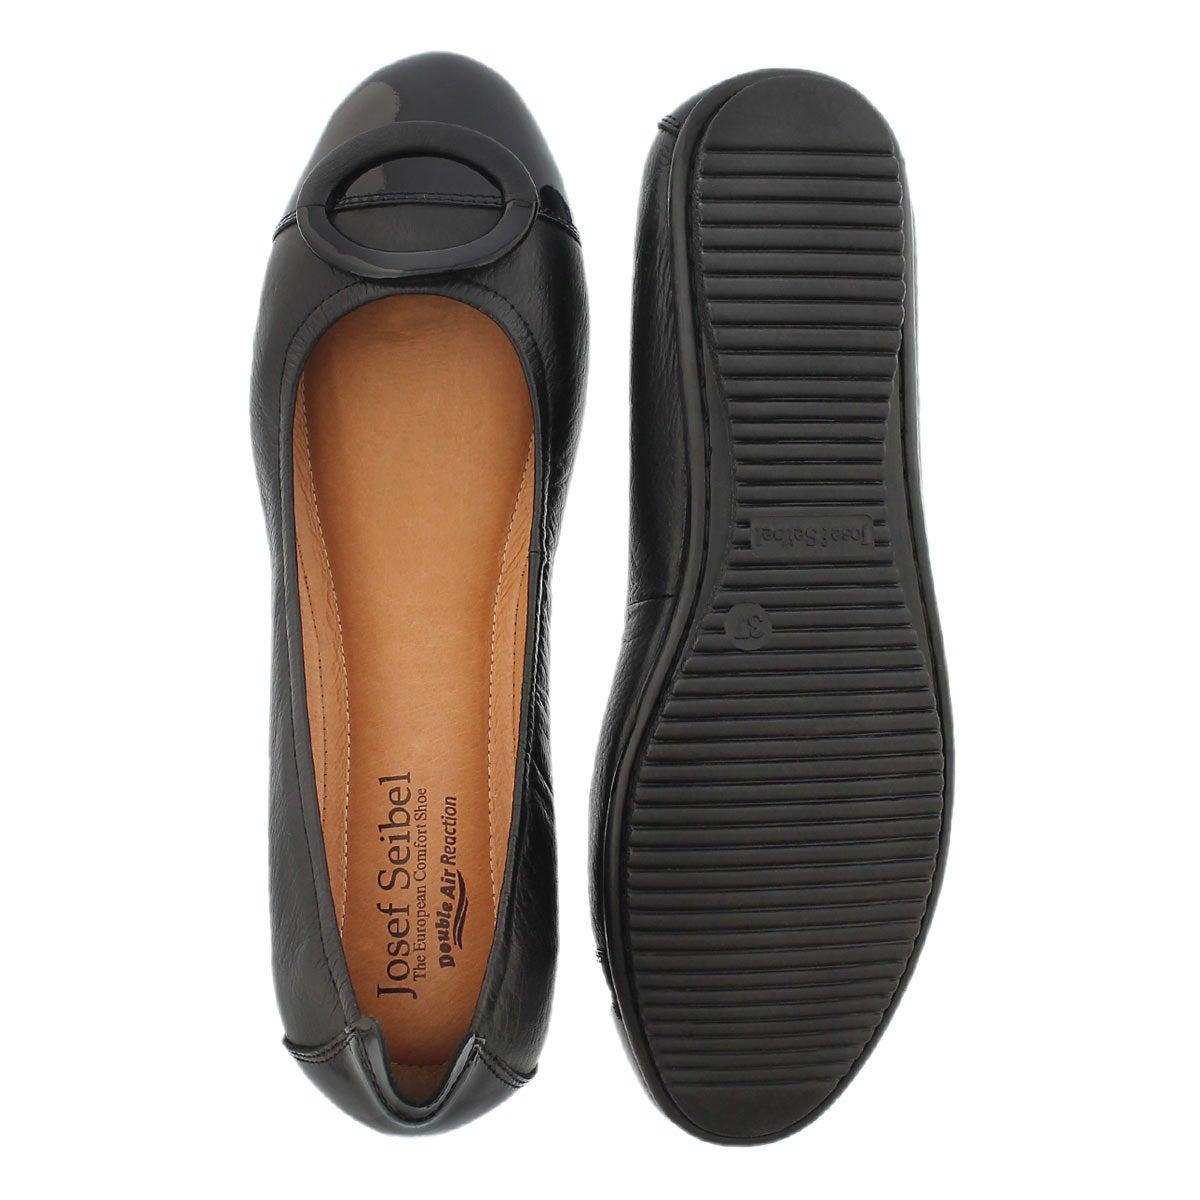 Lds Pippa 19 black leather dress flat